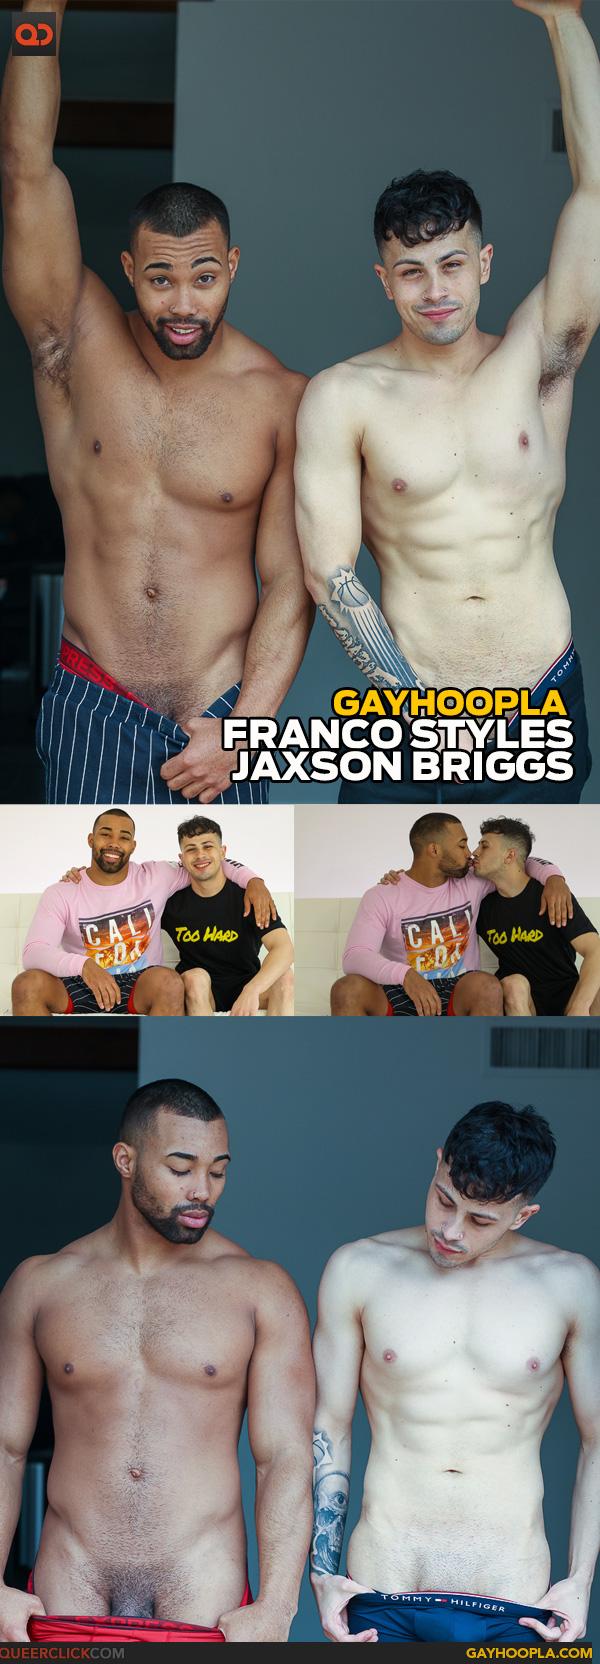 GayHoopla: Franco Styles and Jaxson Briggs